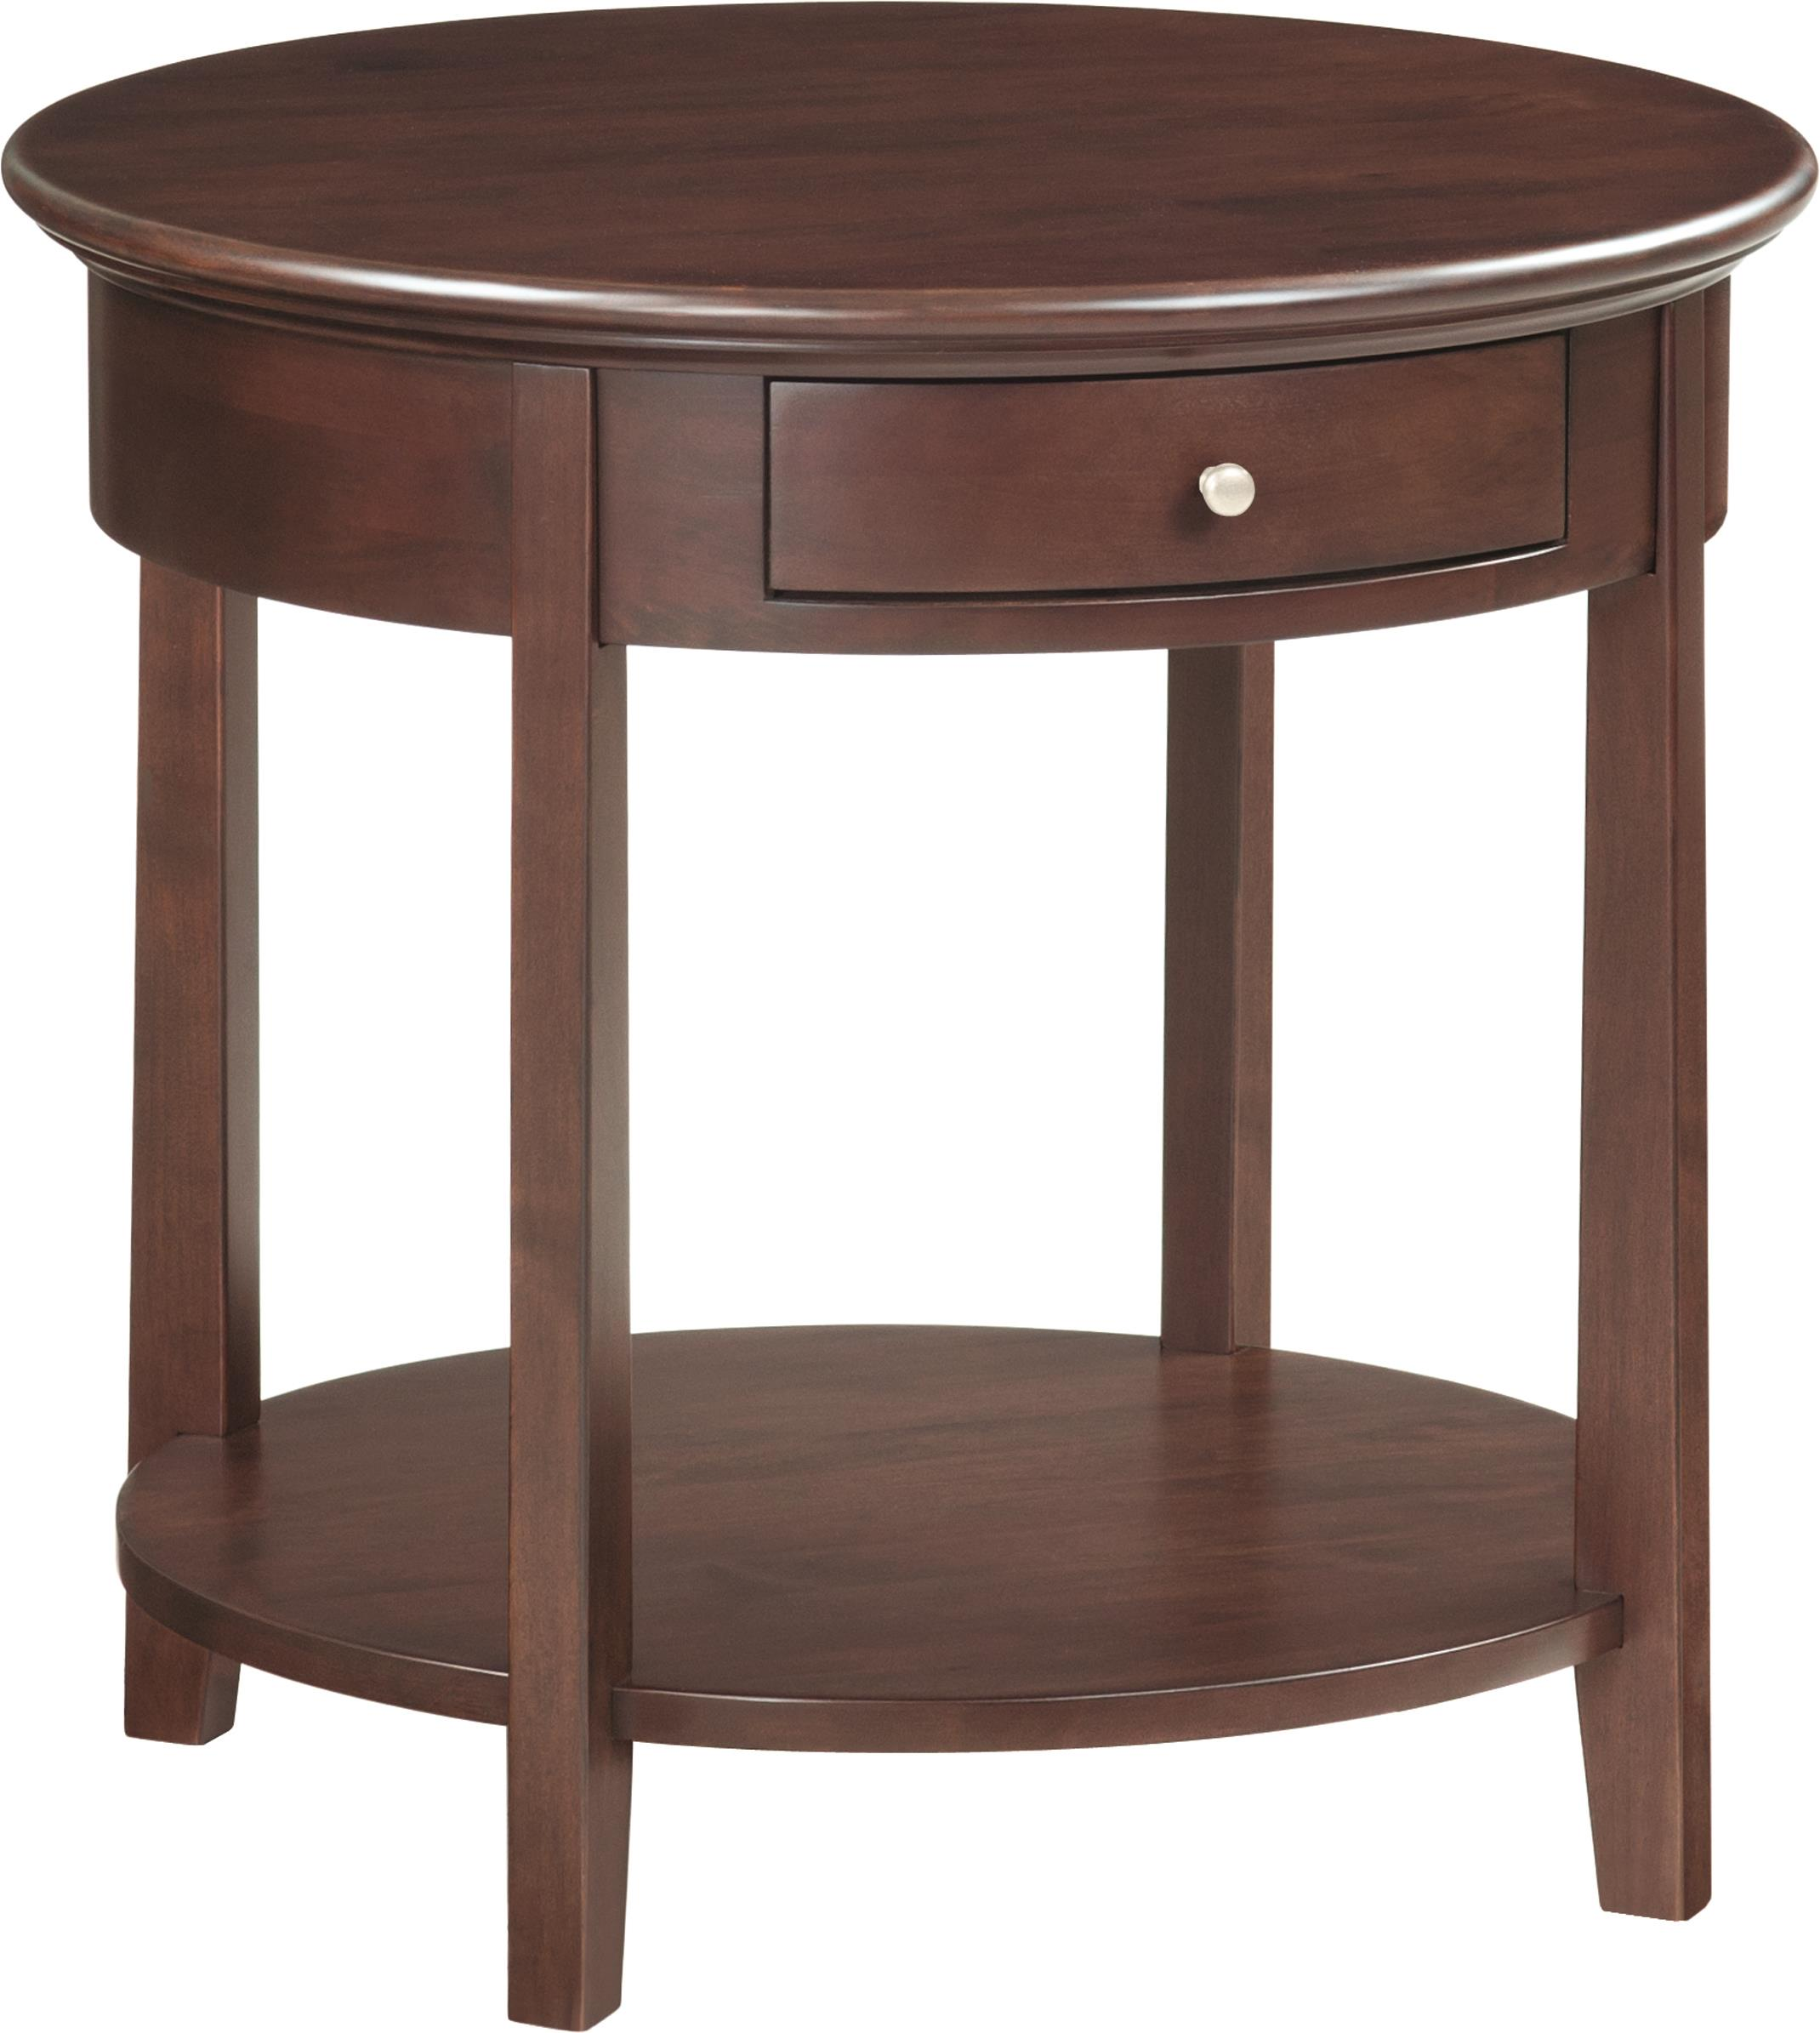 McKenzie Round End Table by Whittier Wood at HomeWorld Furniture